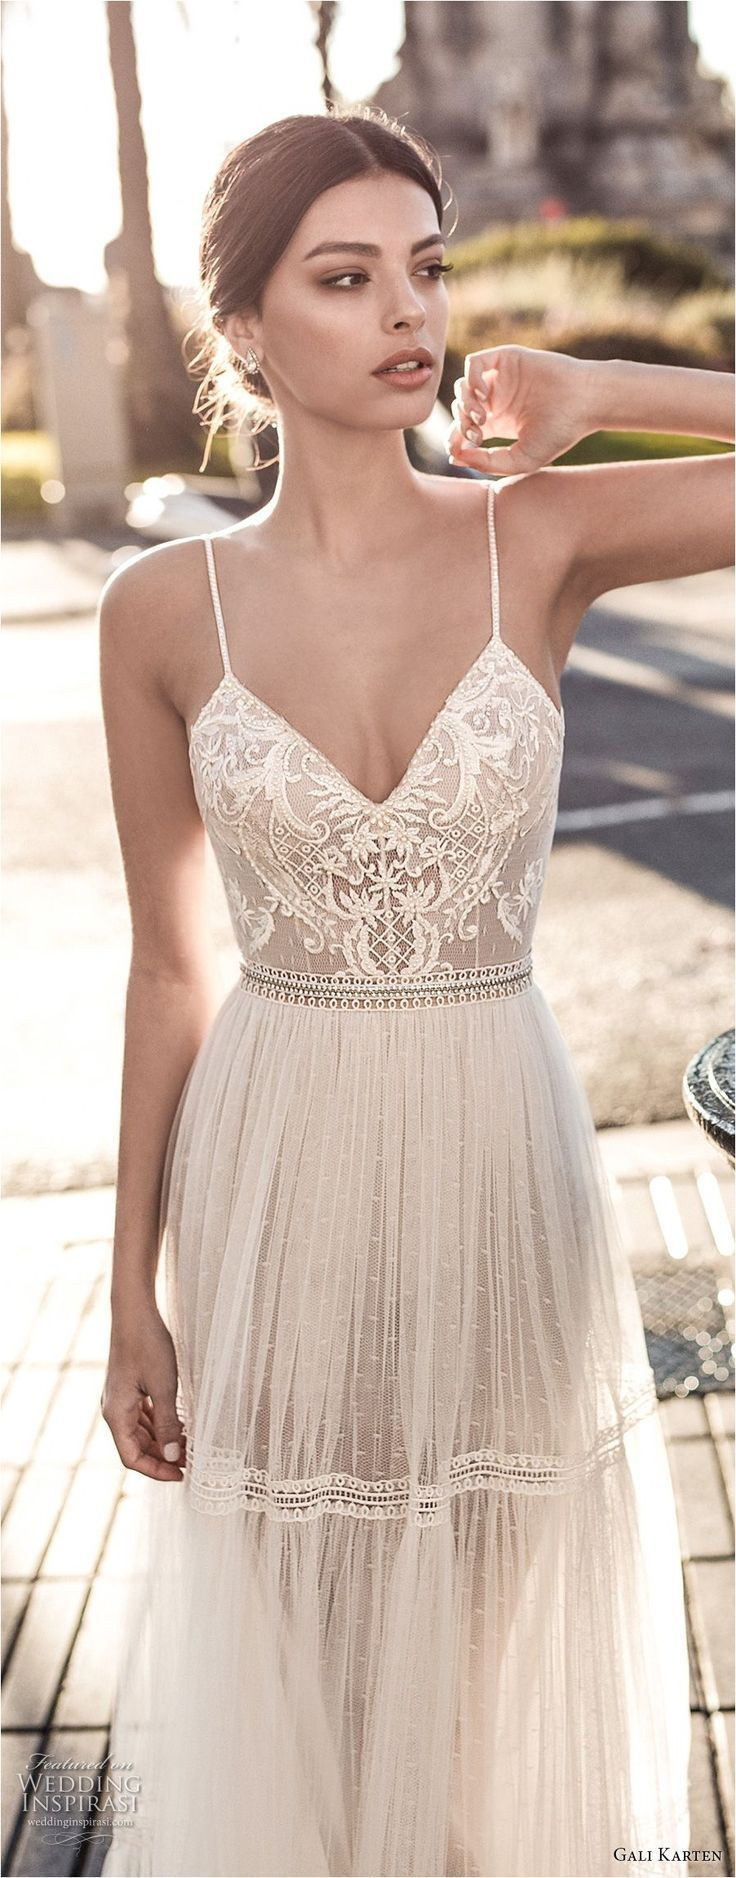 Perfect beach wedding dress. So pretty!